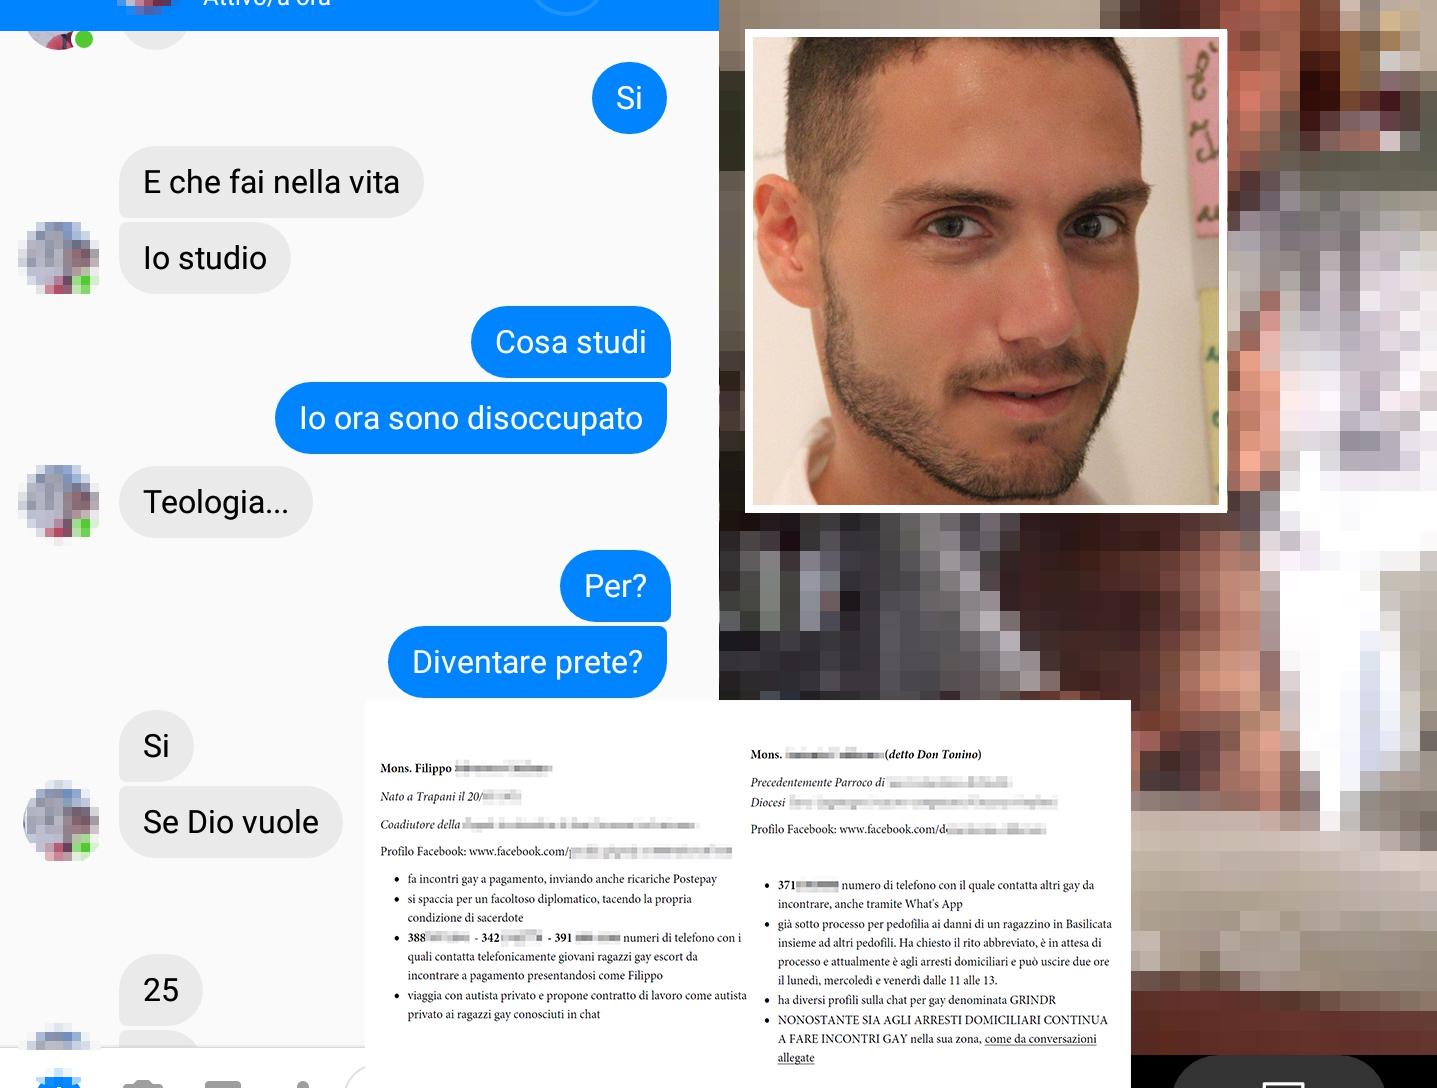 chat gay giovani come diventare escort gay